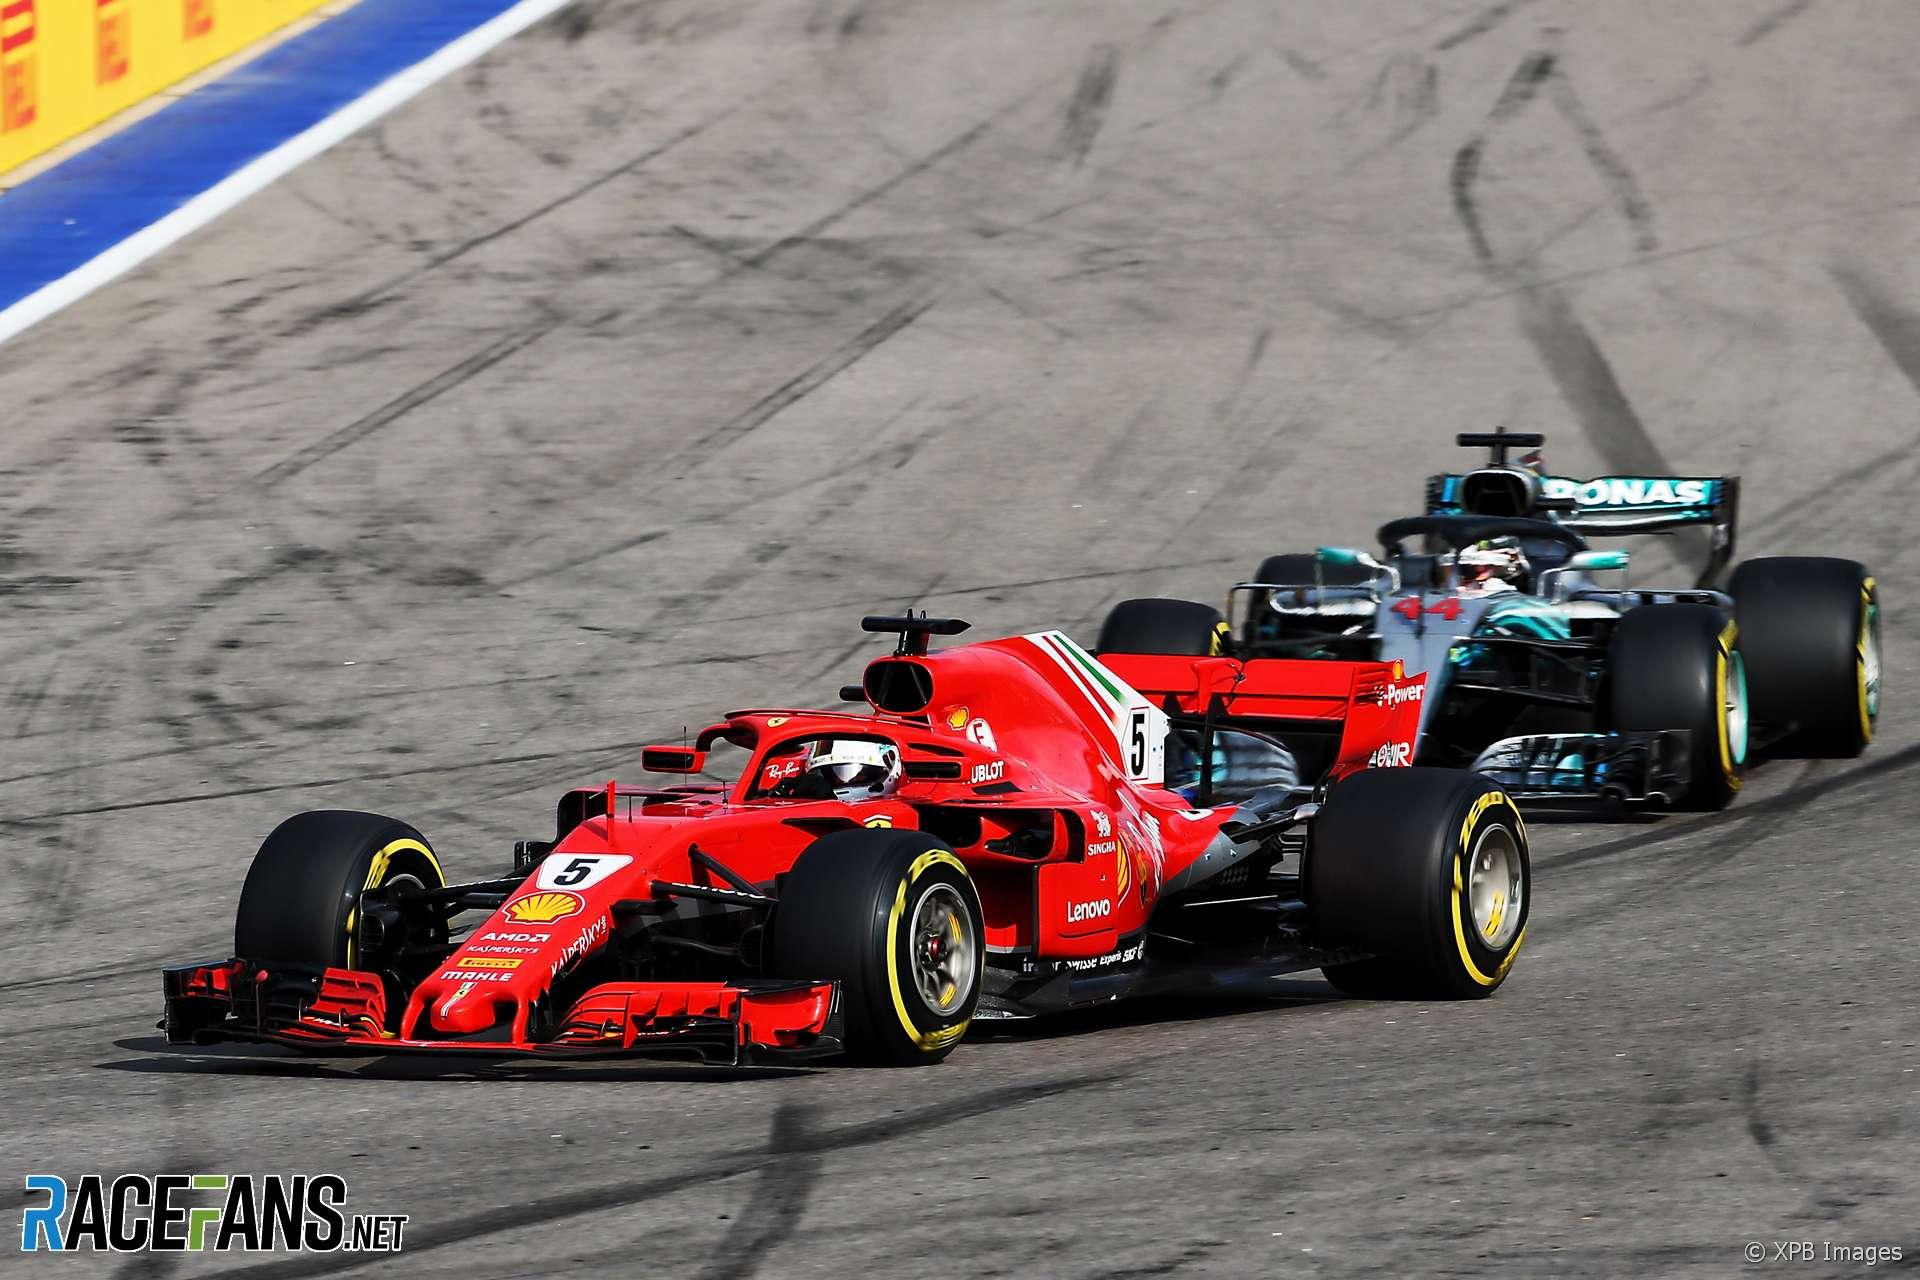 Sebastian Vettel, Lewis Hamilton, Sochi Autodrom, 2018